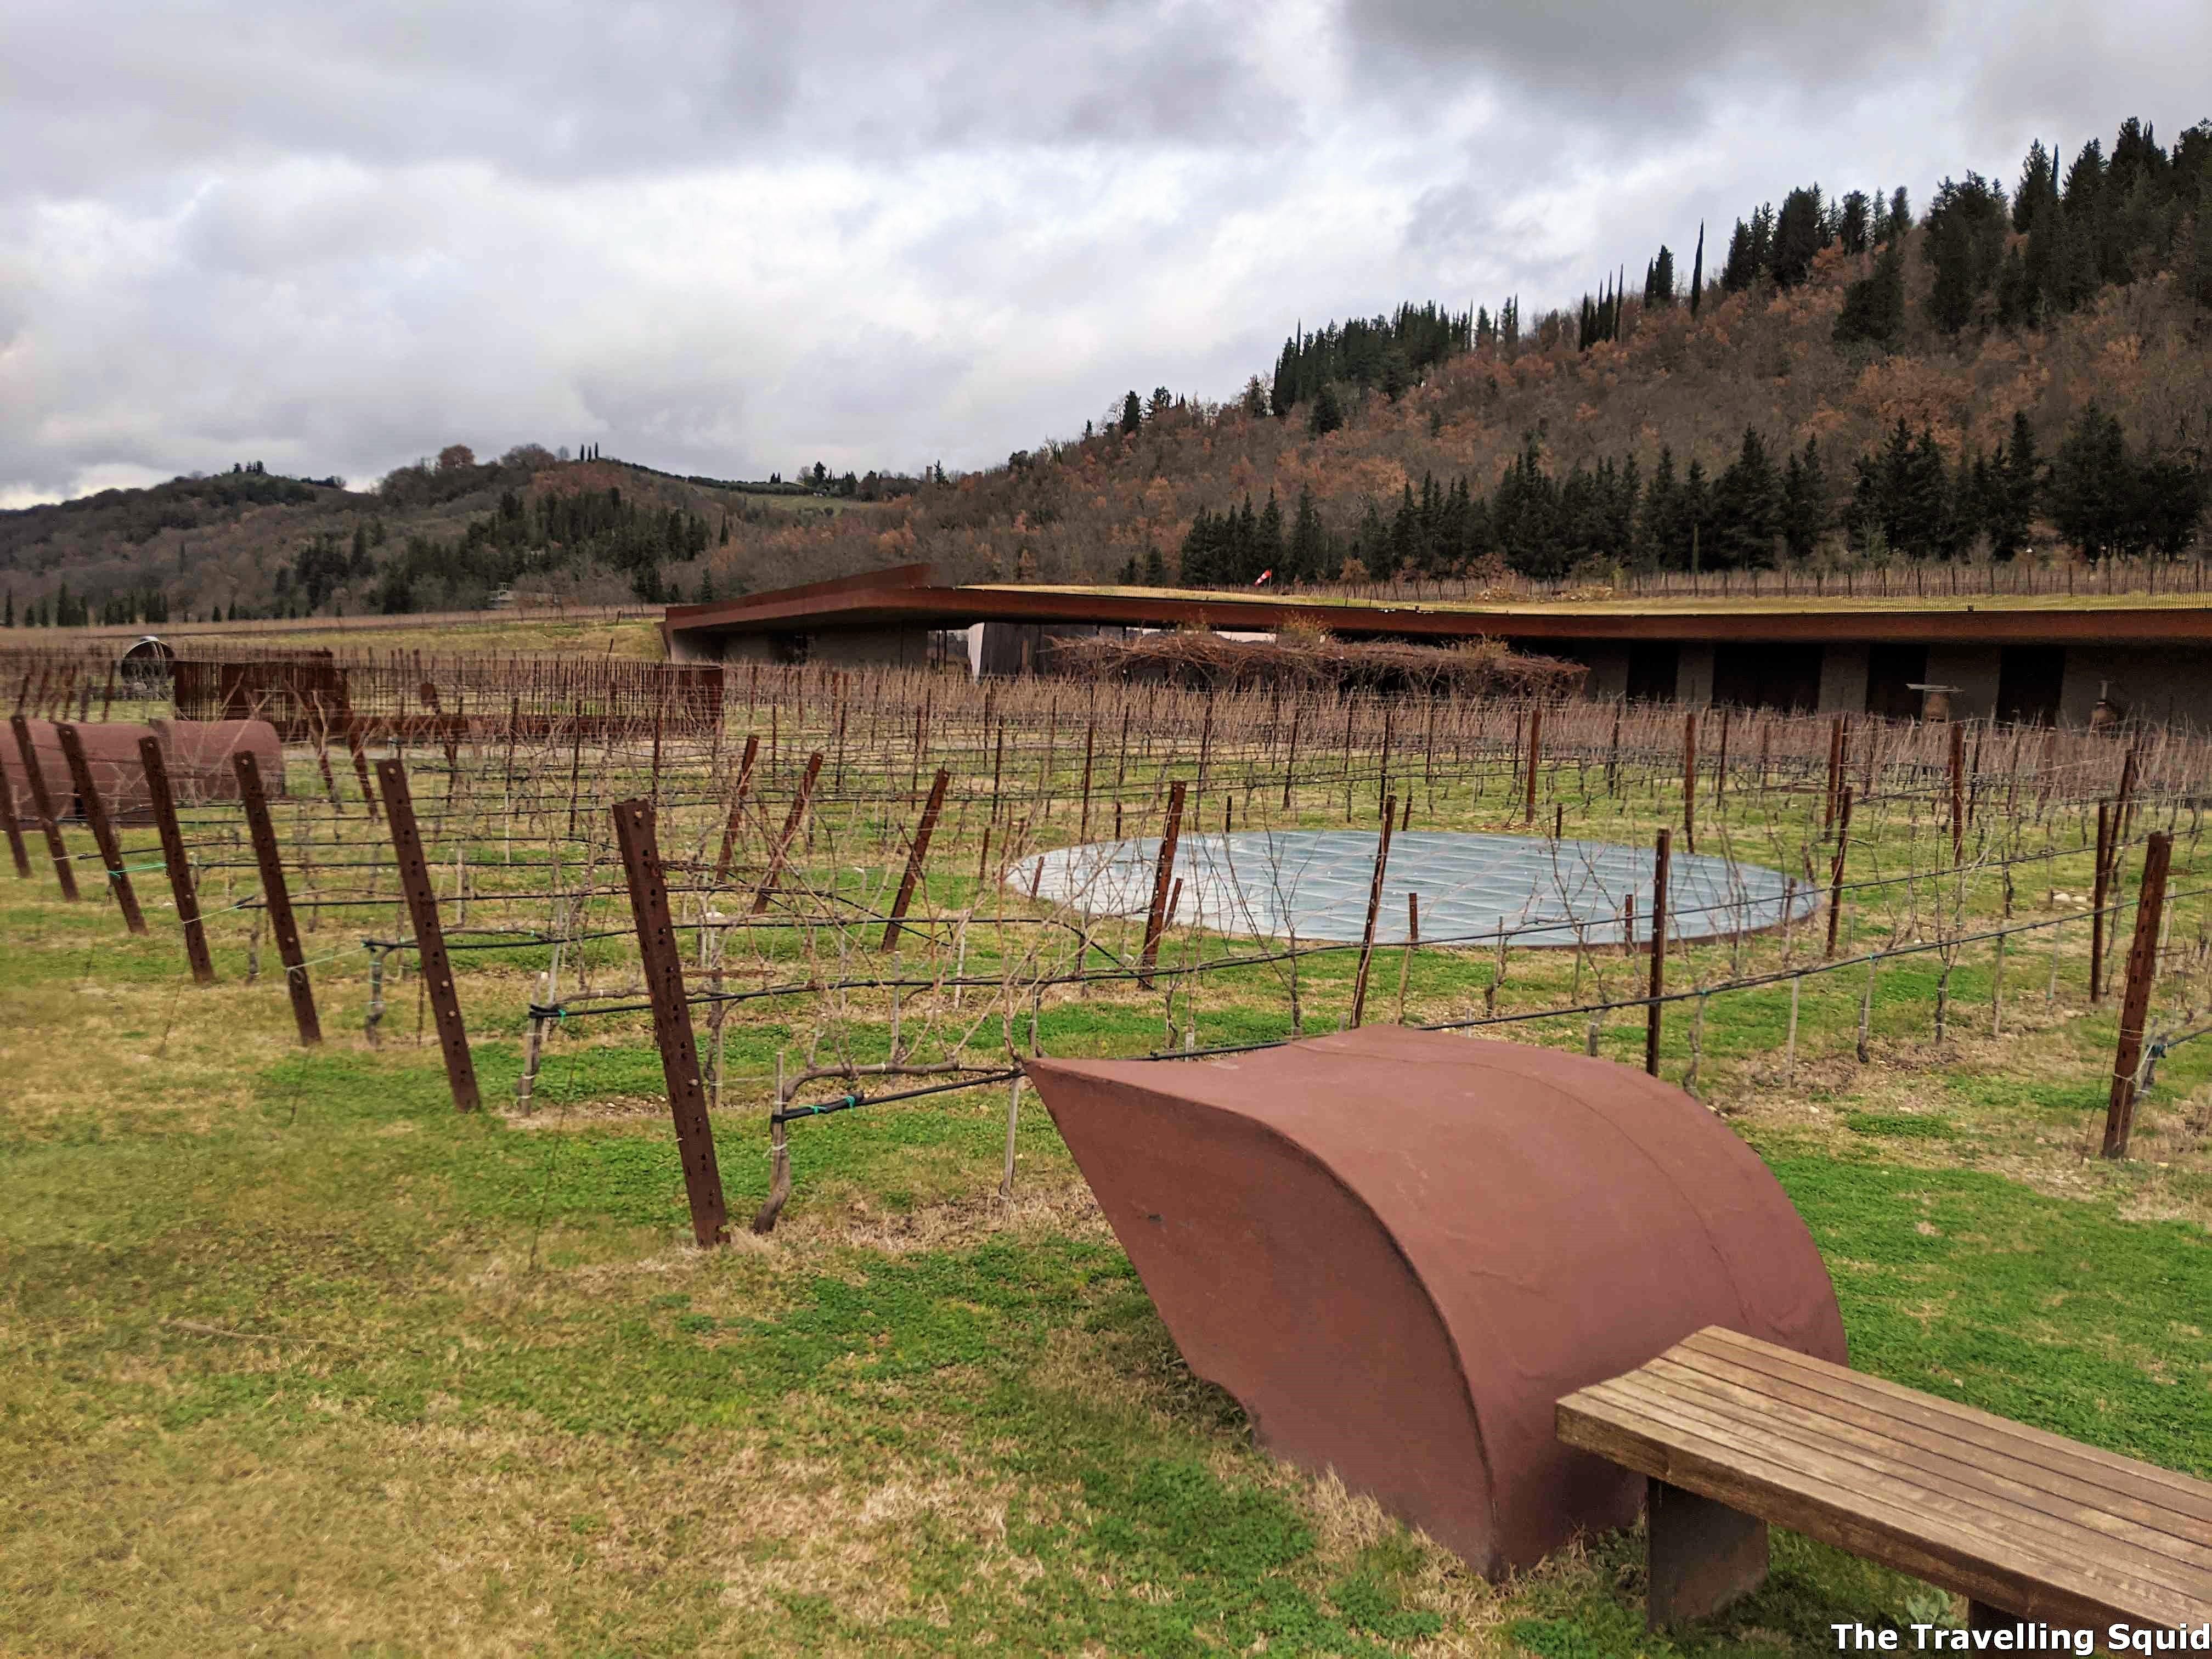 vineyard Antinori nel Chianti Classico